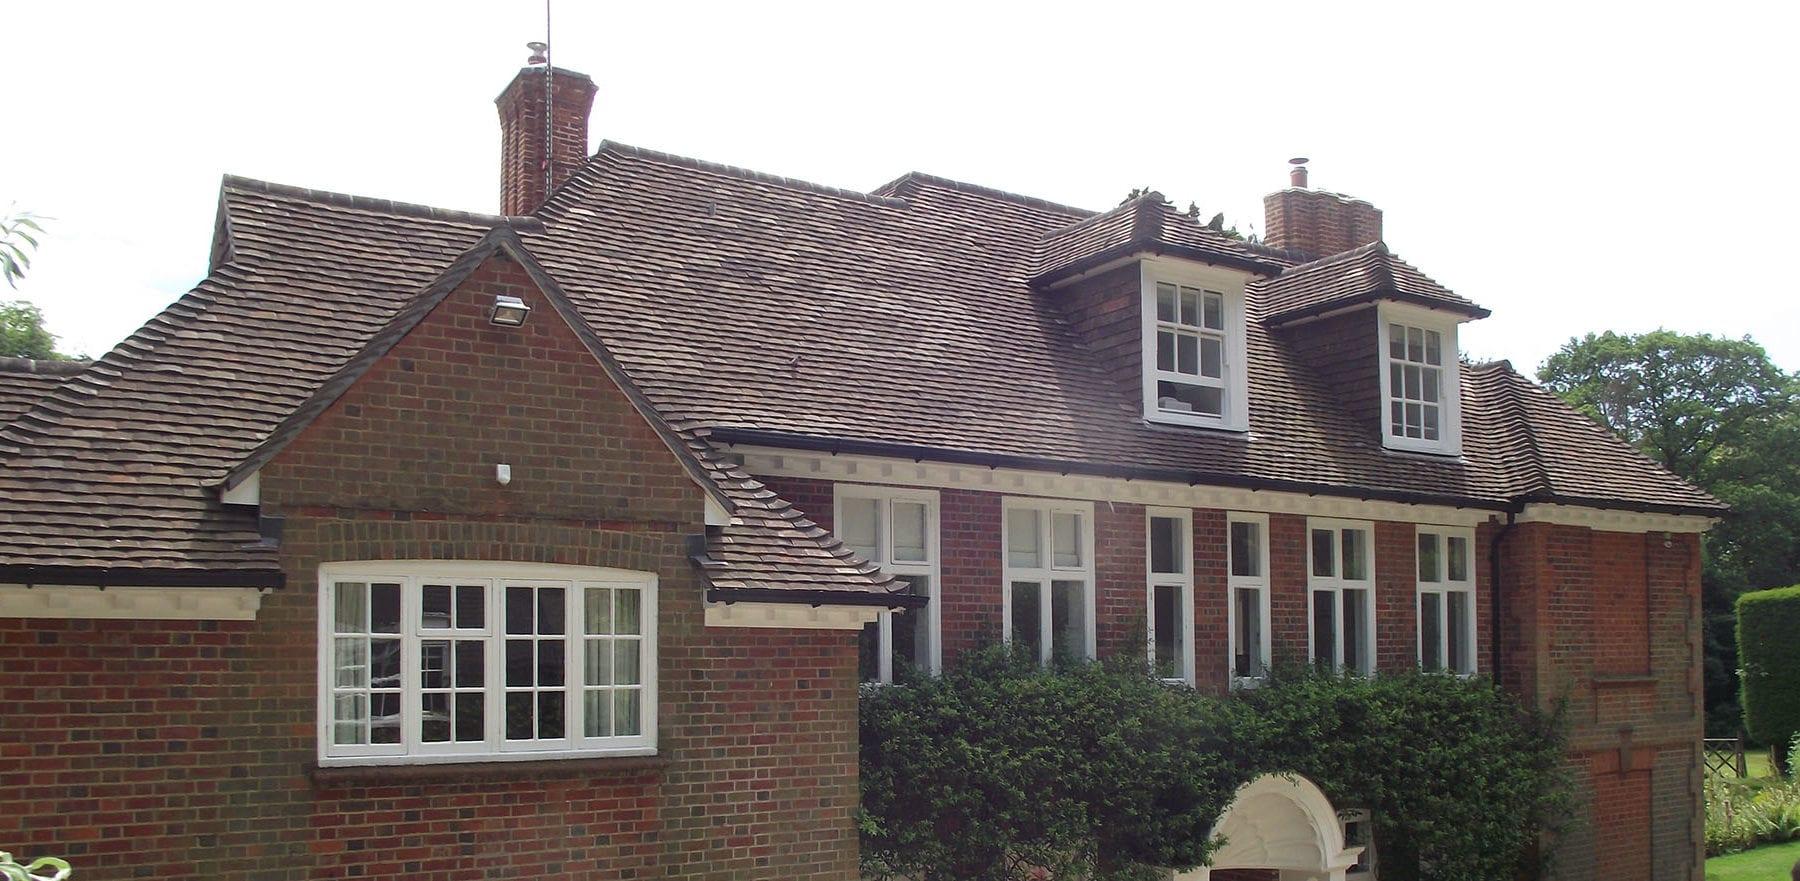 Lifestiles - Handmade Restoration Clay Roof Tiles - Farnham, England 5